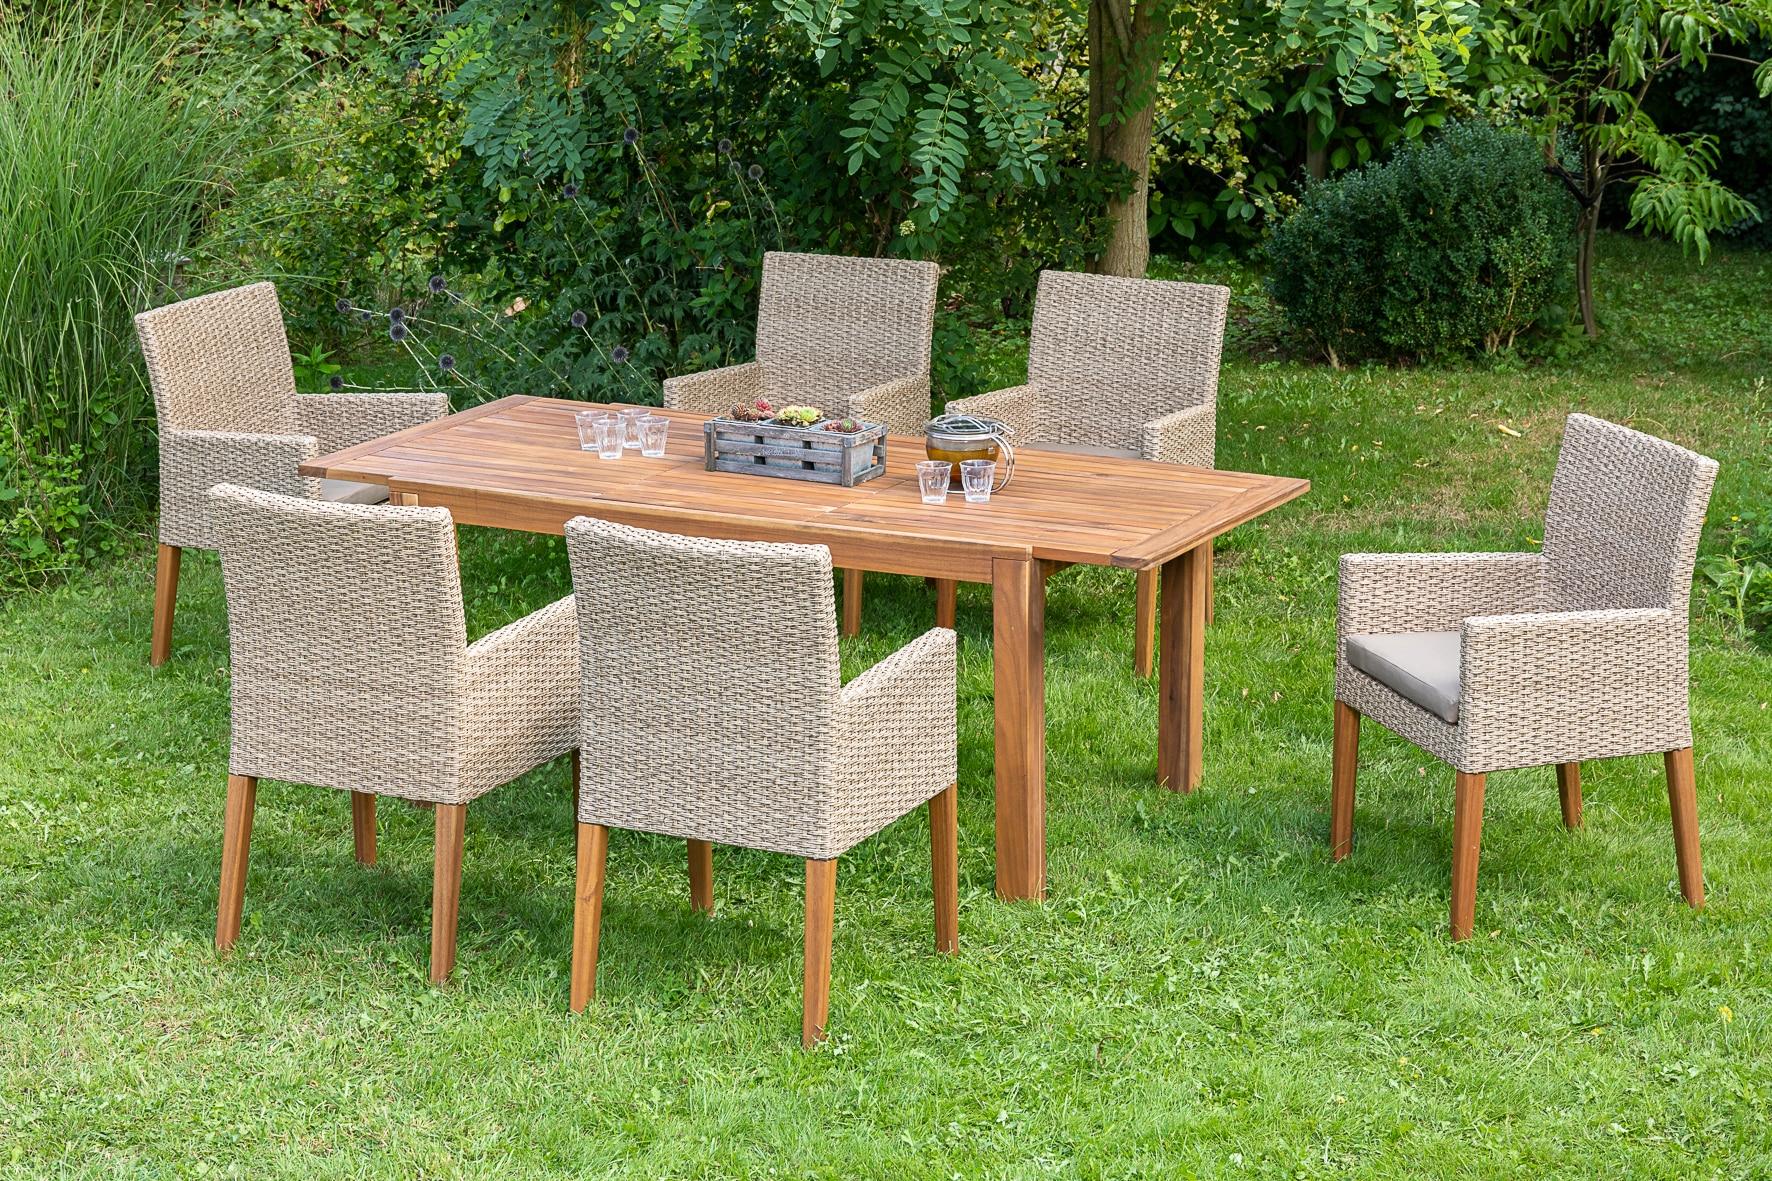 MERXX Diningset Ranzano 13-tlg 6x Sessel Tisch 90x200 cm inkl Sitzkissen